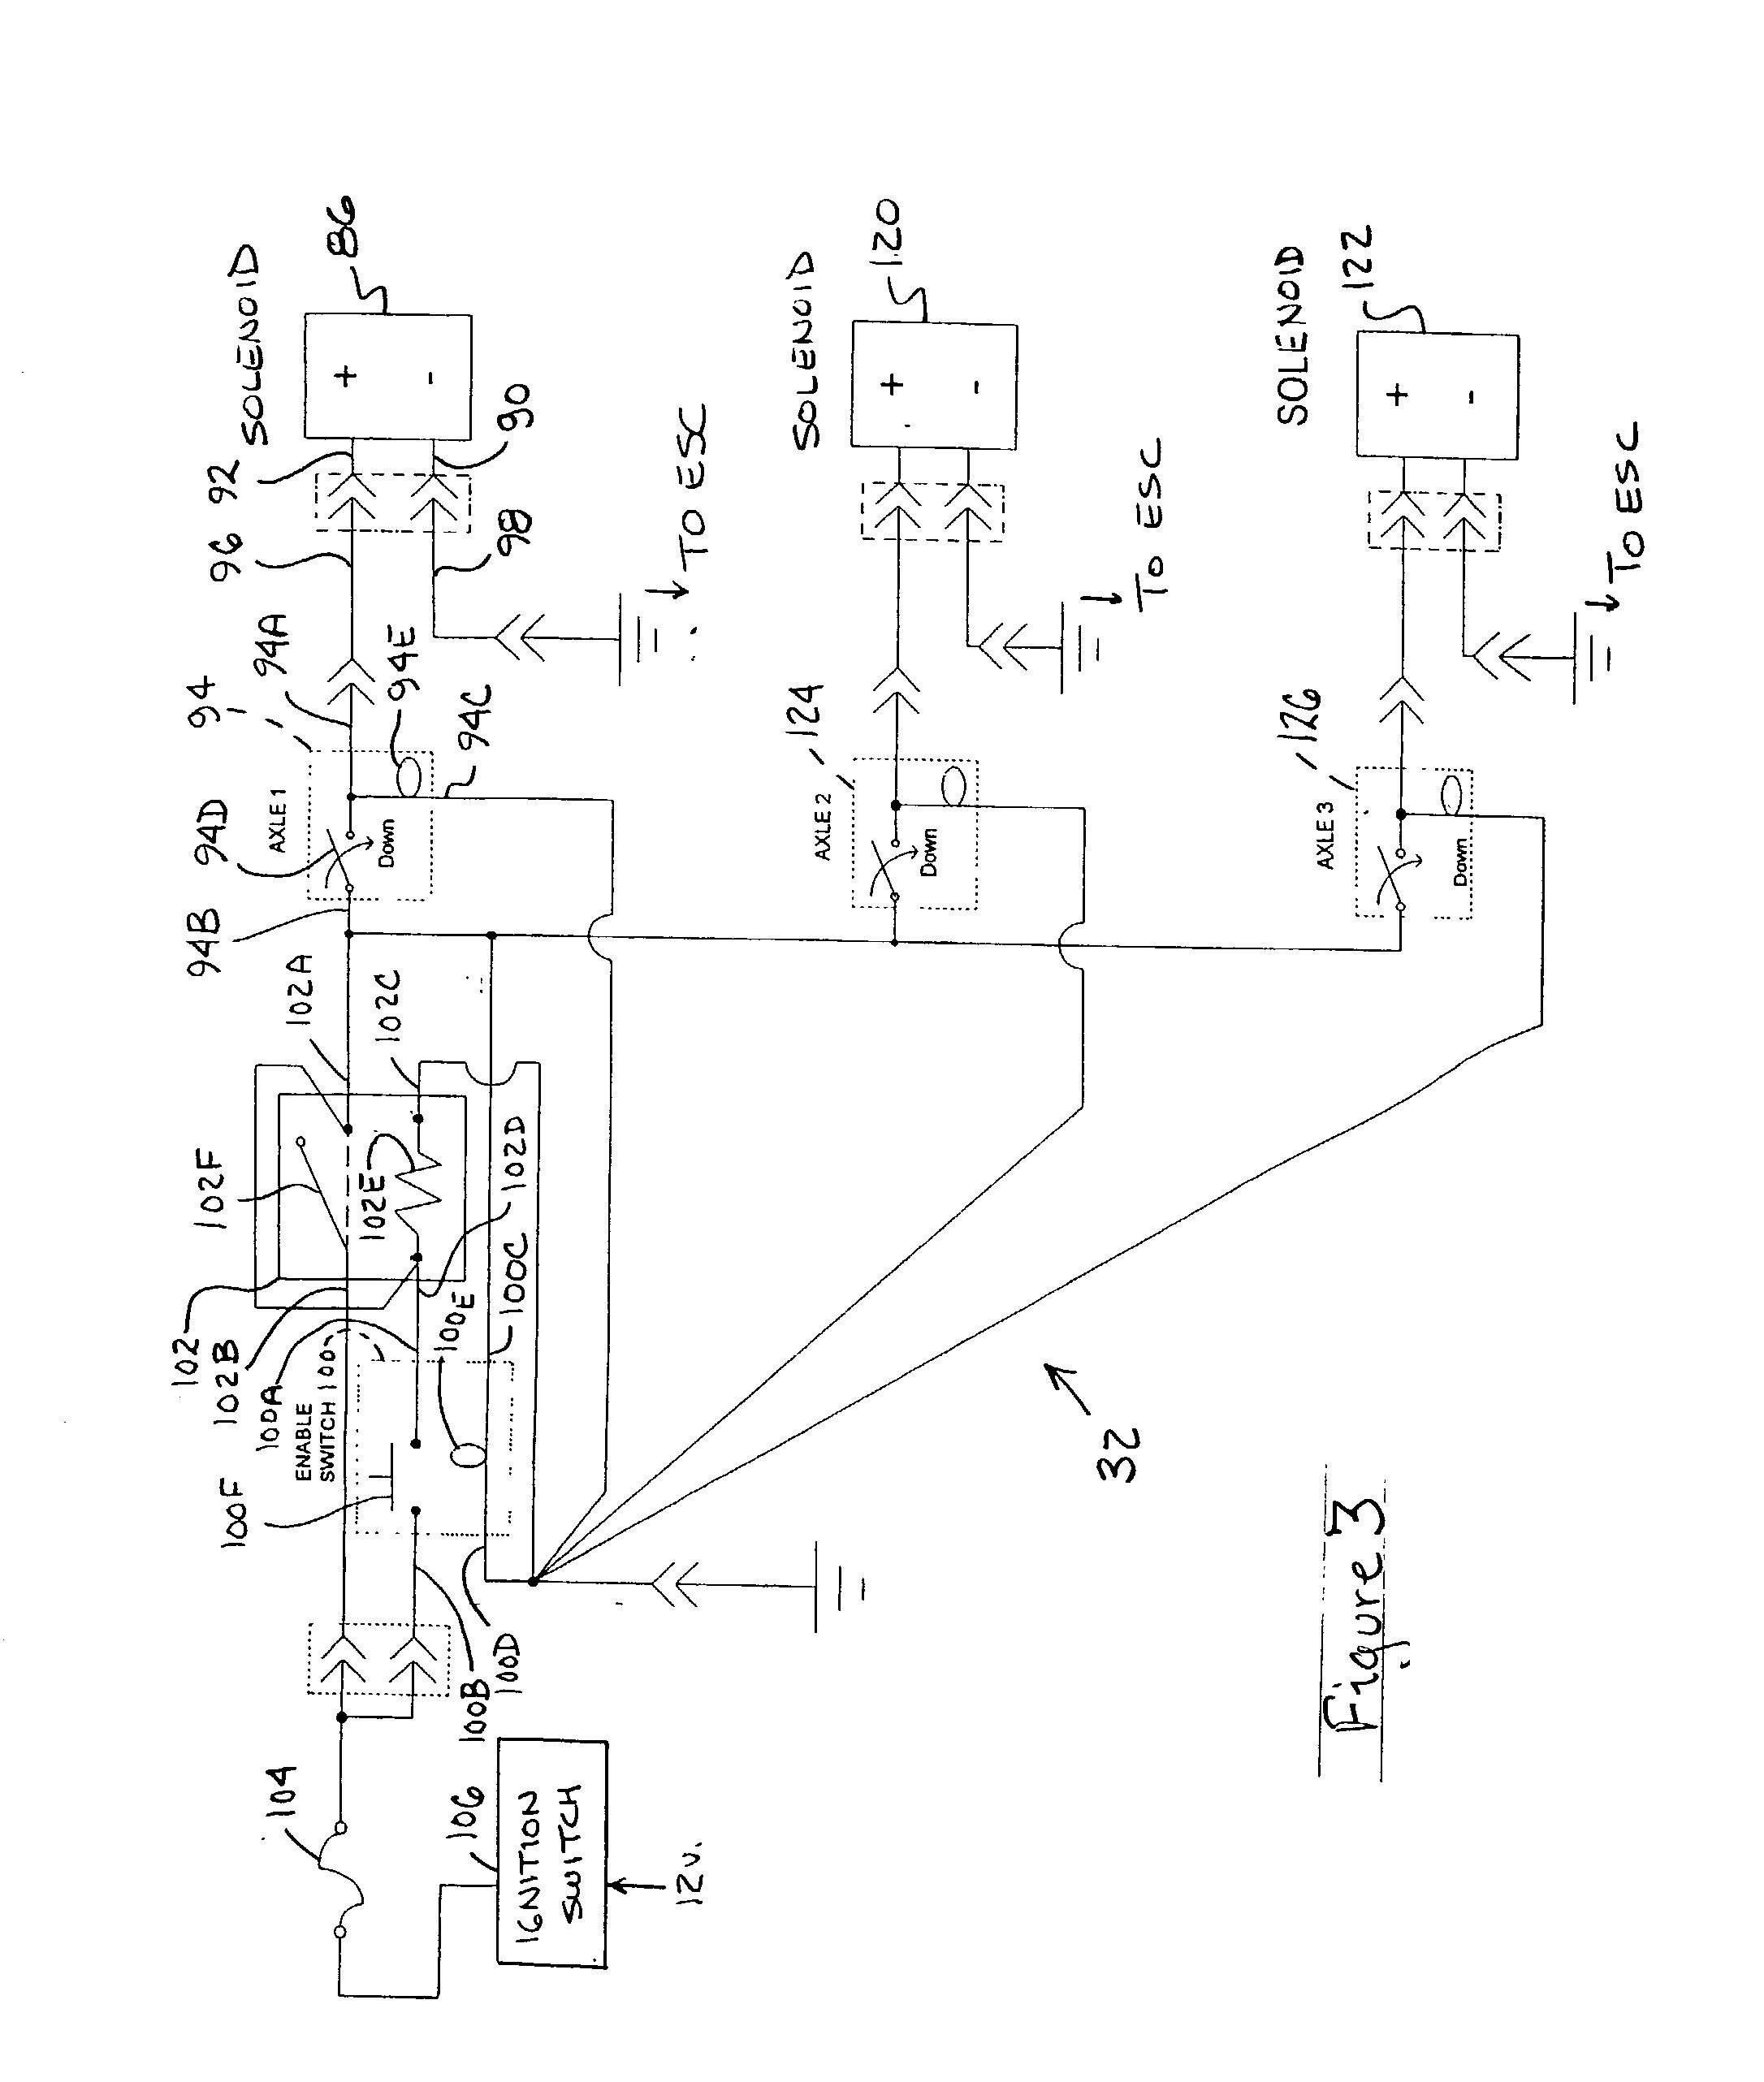 lift axle plumbing diagram wiring diagrams